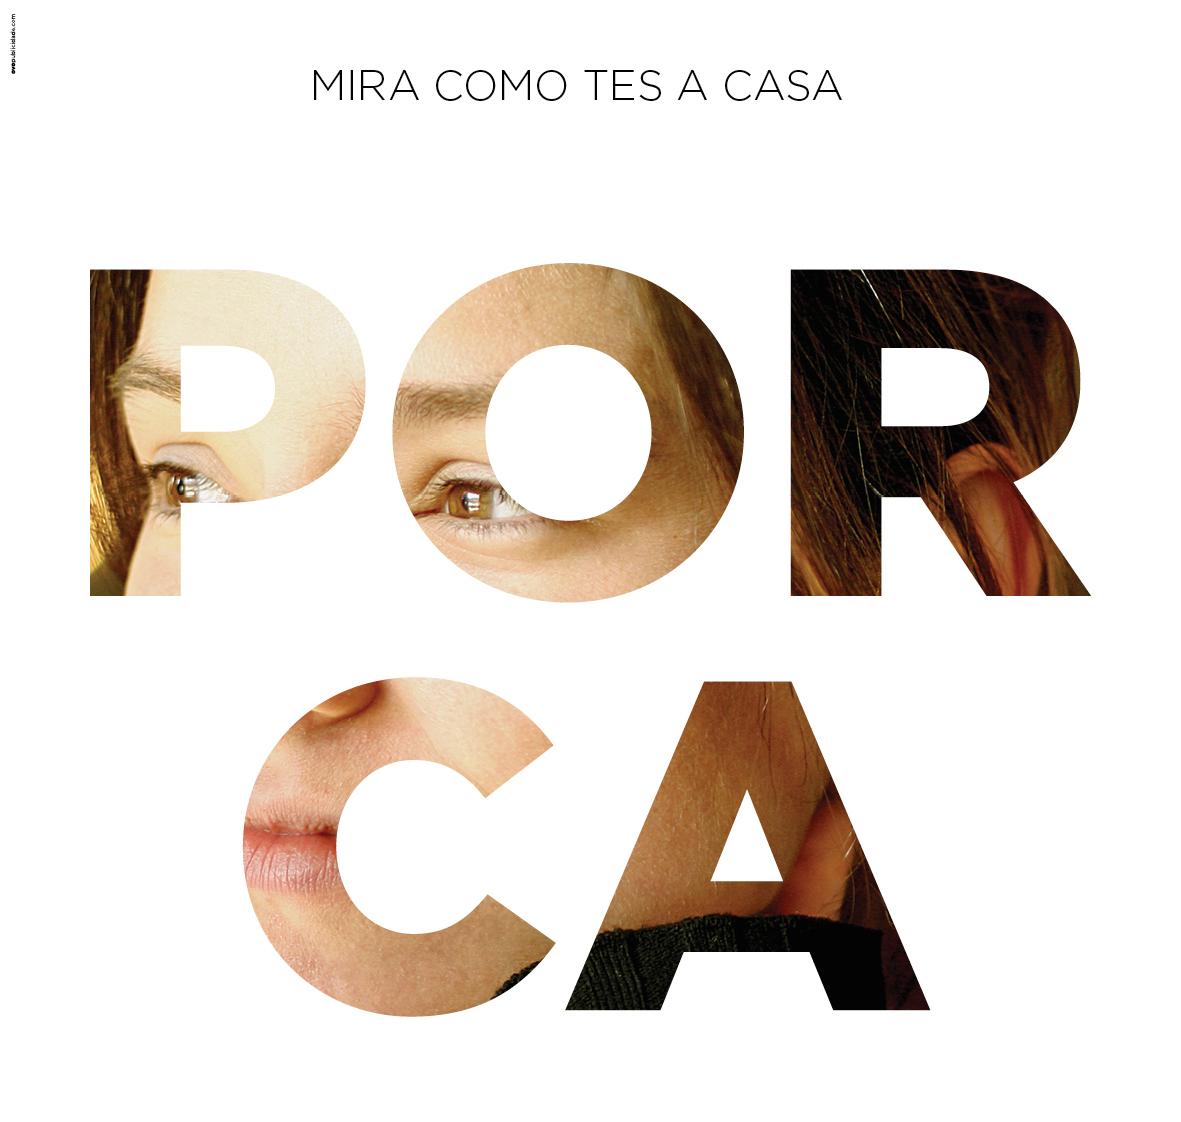 Puta - Burra - Cerda - Campaña Violencia Genero_Pontevedra_Blog the orange market